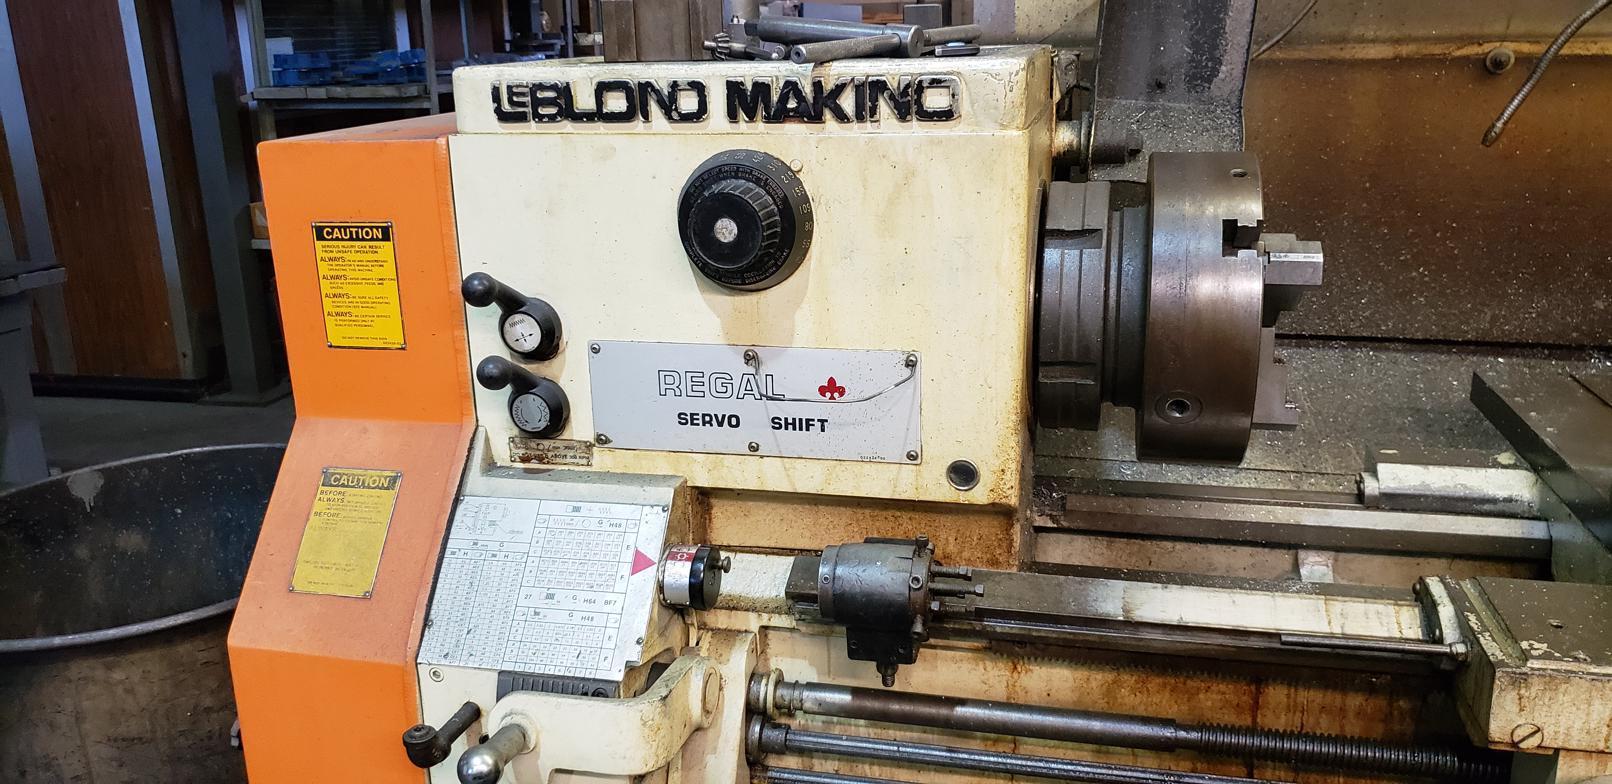 "20"" X 80"" LEBLOND MAKINO REGAL SERVO SHIFT LATHE. STOCK # 0954120"